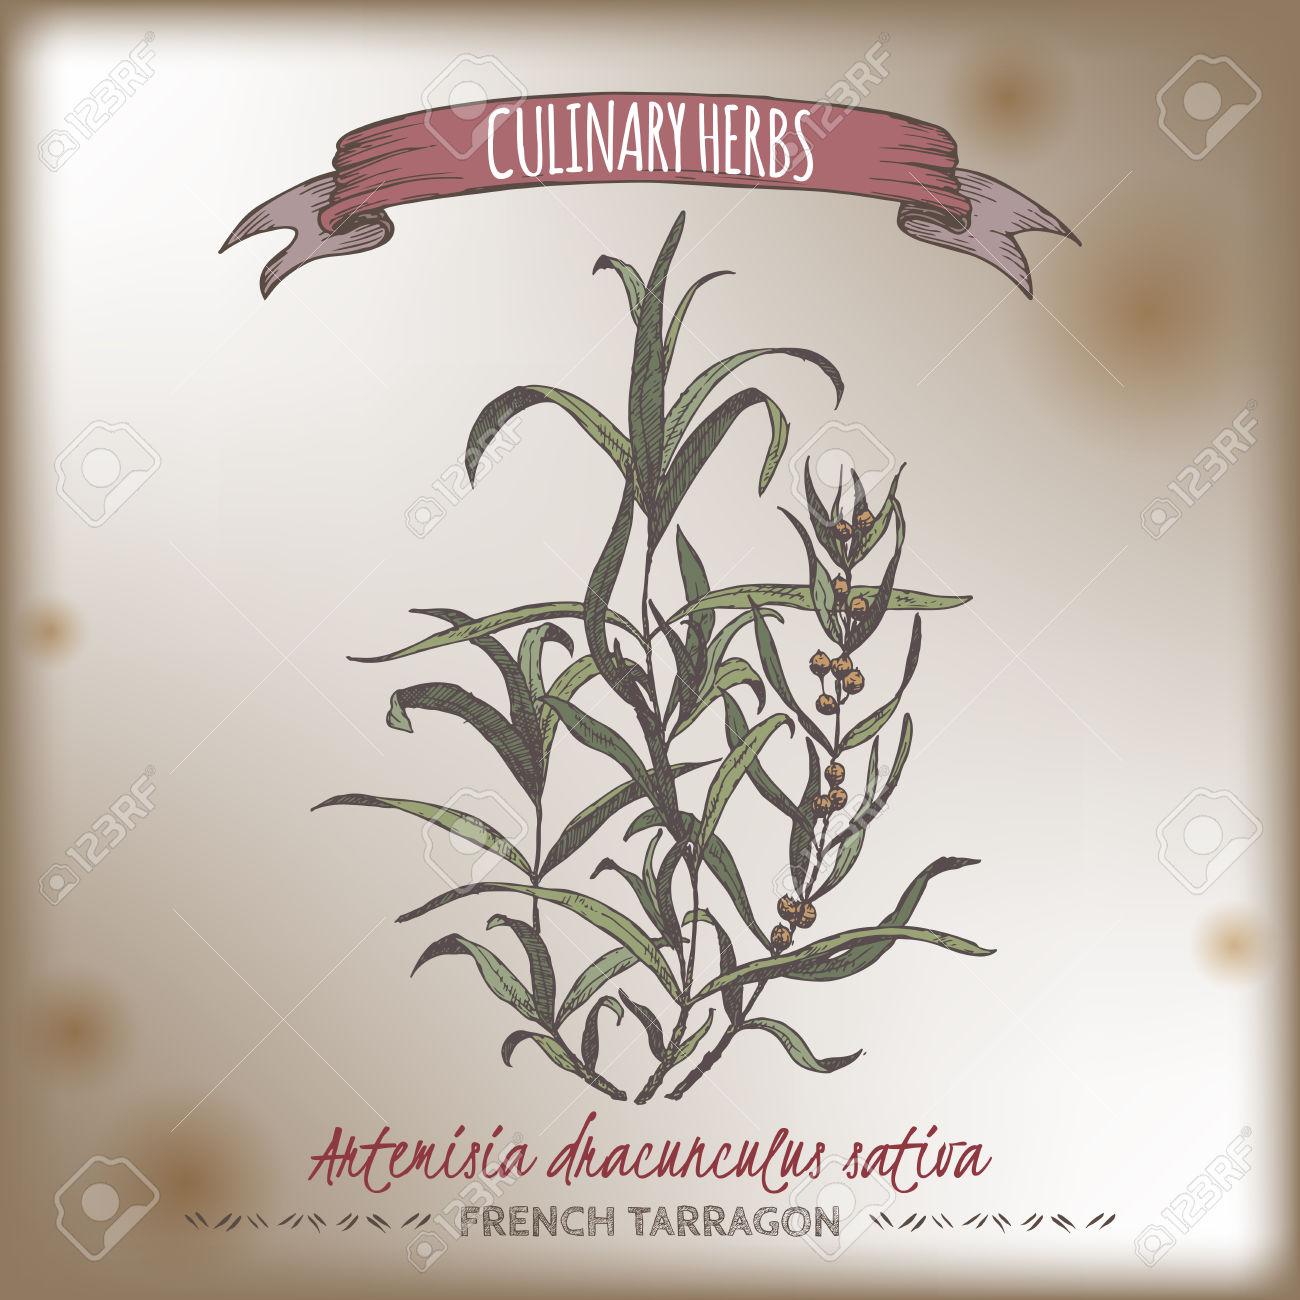 Artemisia Dracunculus Sativa Aka French Tarragon Color Vector.